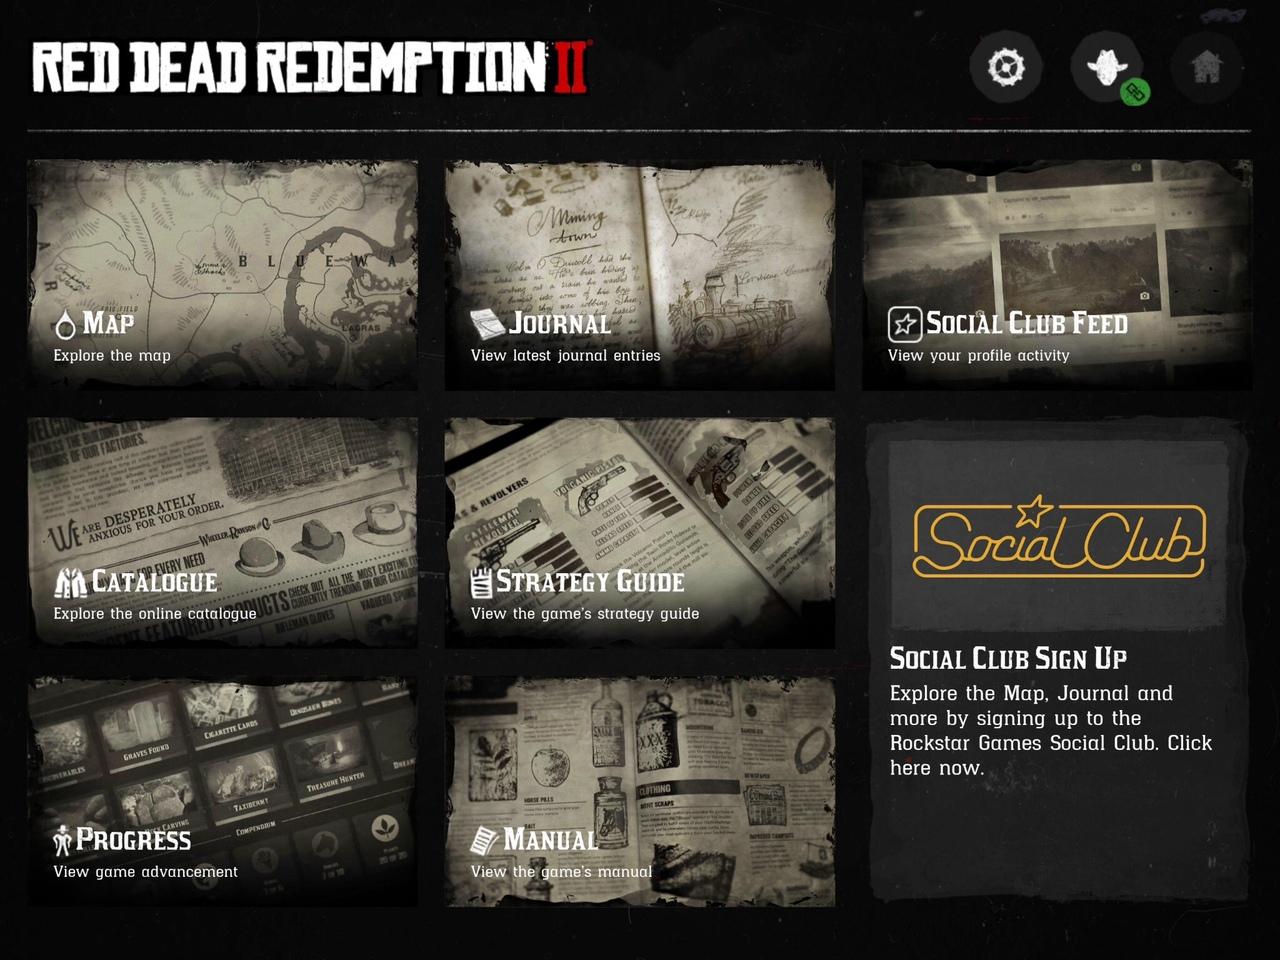 w7tUnFJ_MmA.jpg - Red Dead Redemption 2